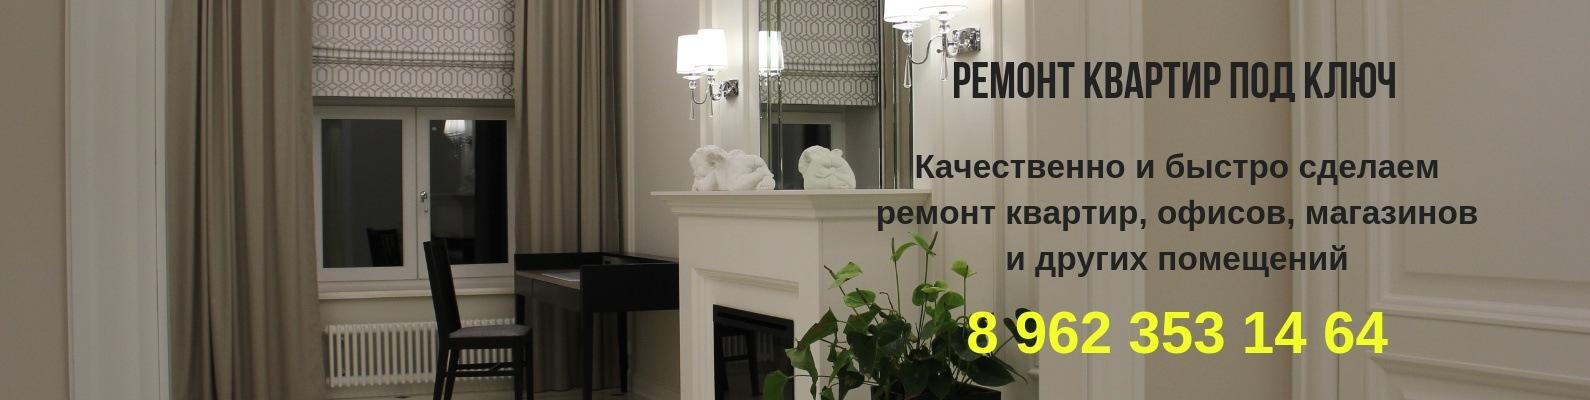 Ремонт квартир под ключ СПб. | ВКонтакте